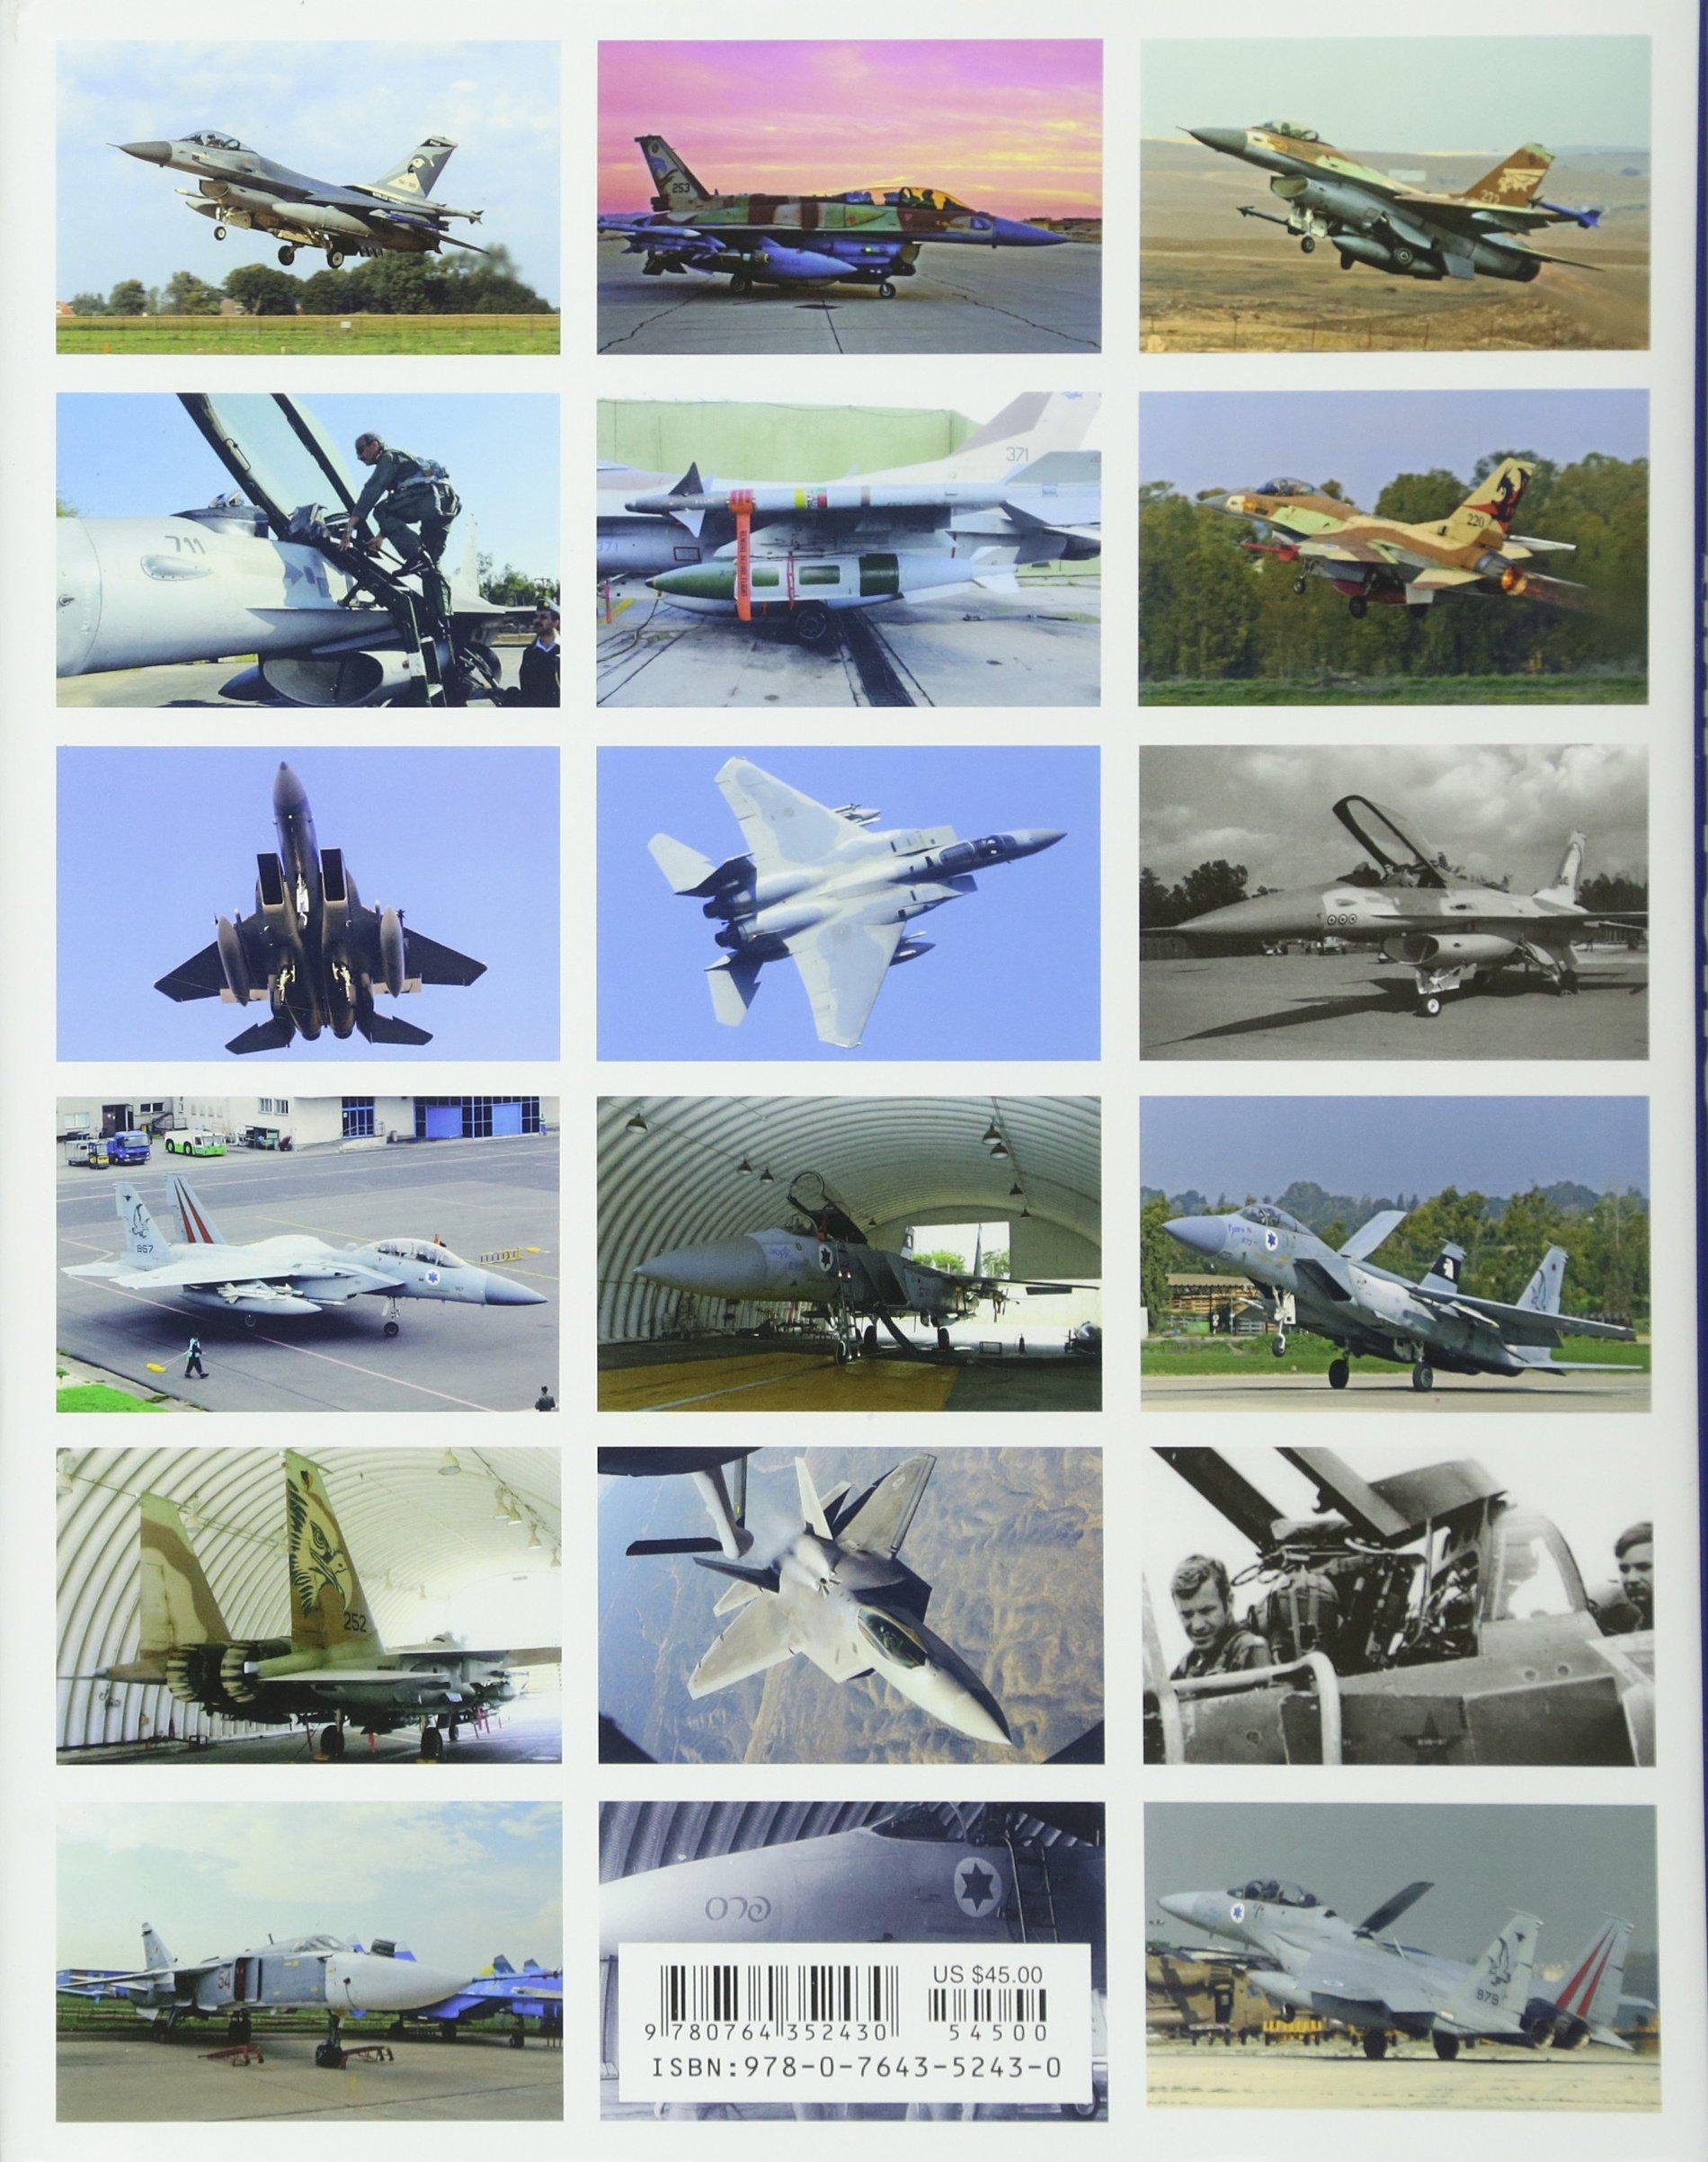 The Raptors: All F-15 and F-16 Aerial Combat Victories: Donald J. McCarthy  Jr.: 9780764352430: Amazon.com: Books